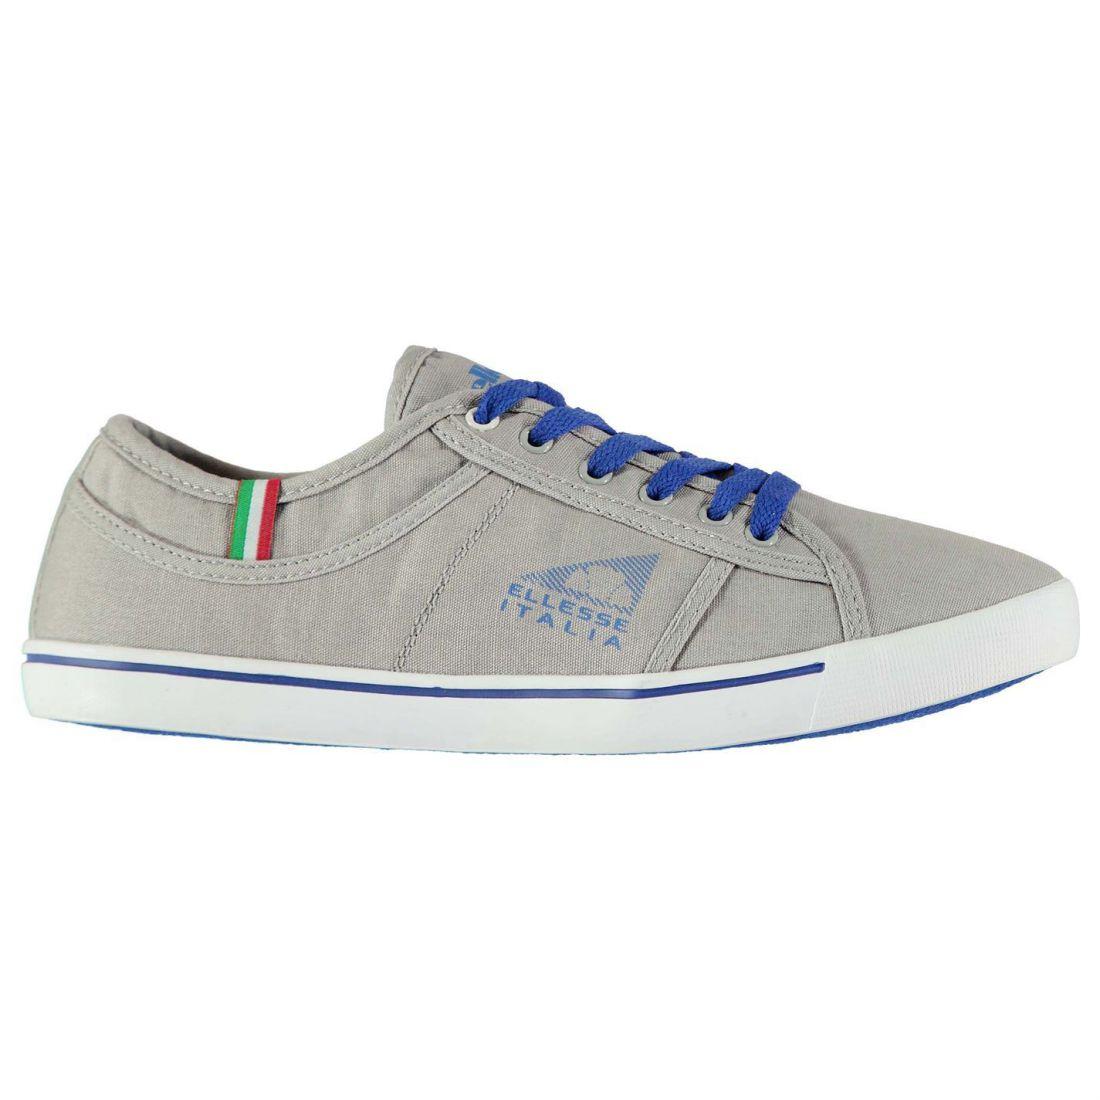 f9f11620cb Details about Ellesse Mens Caluso Shoes Canvas Low Lace Up Casual